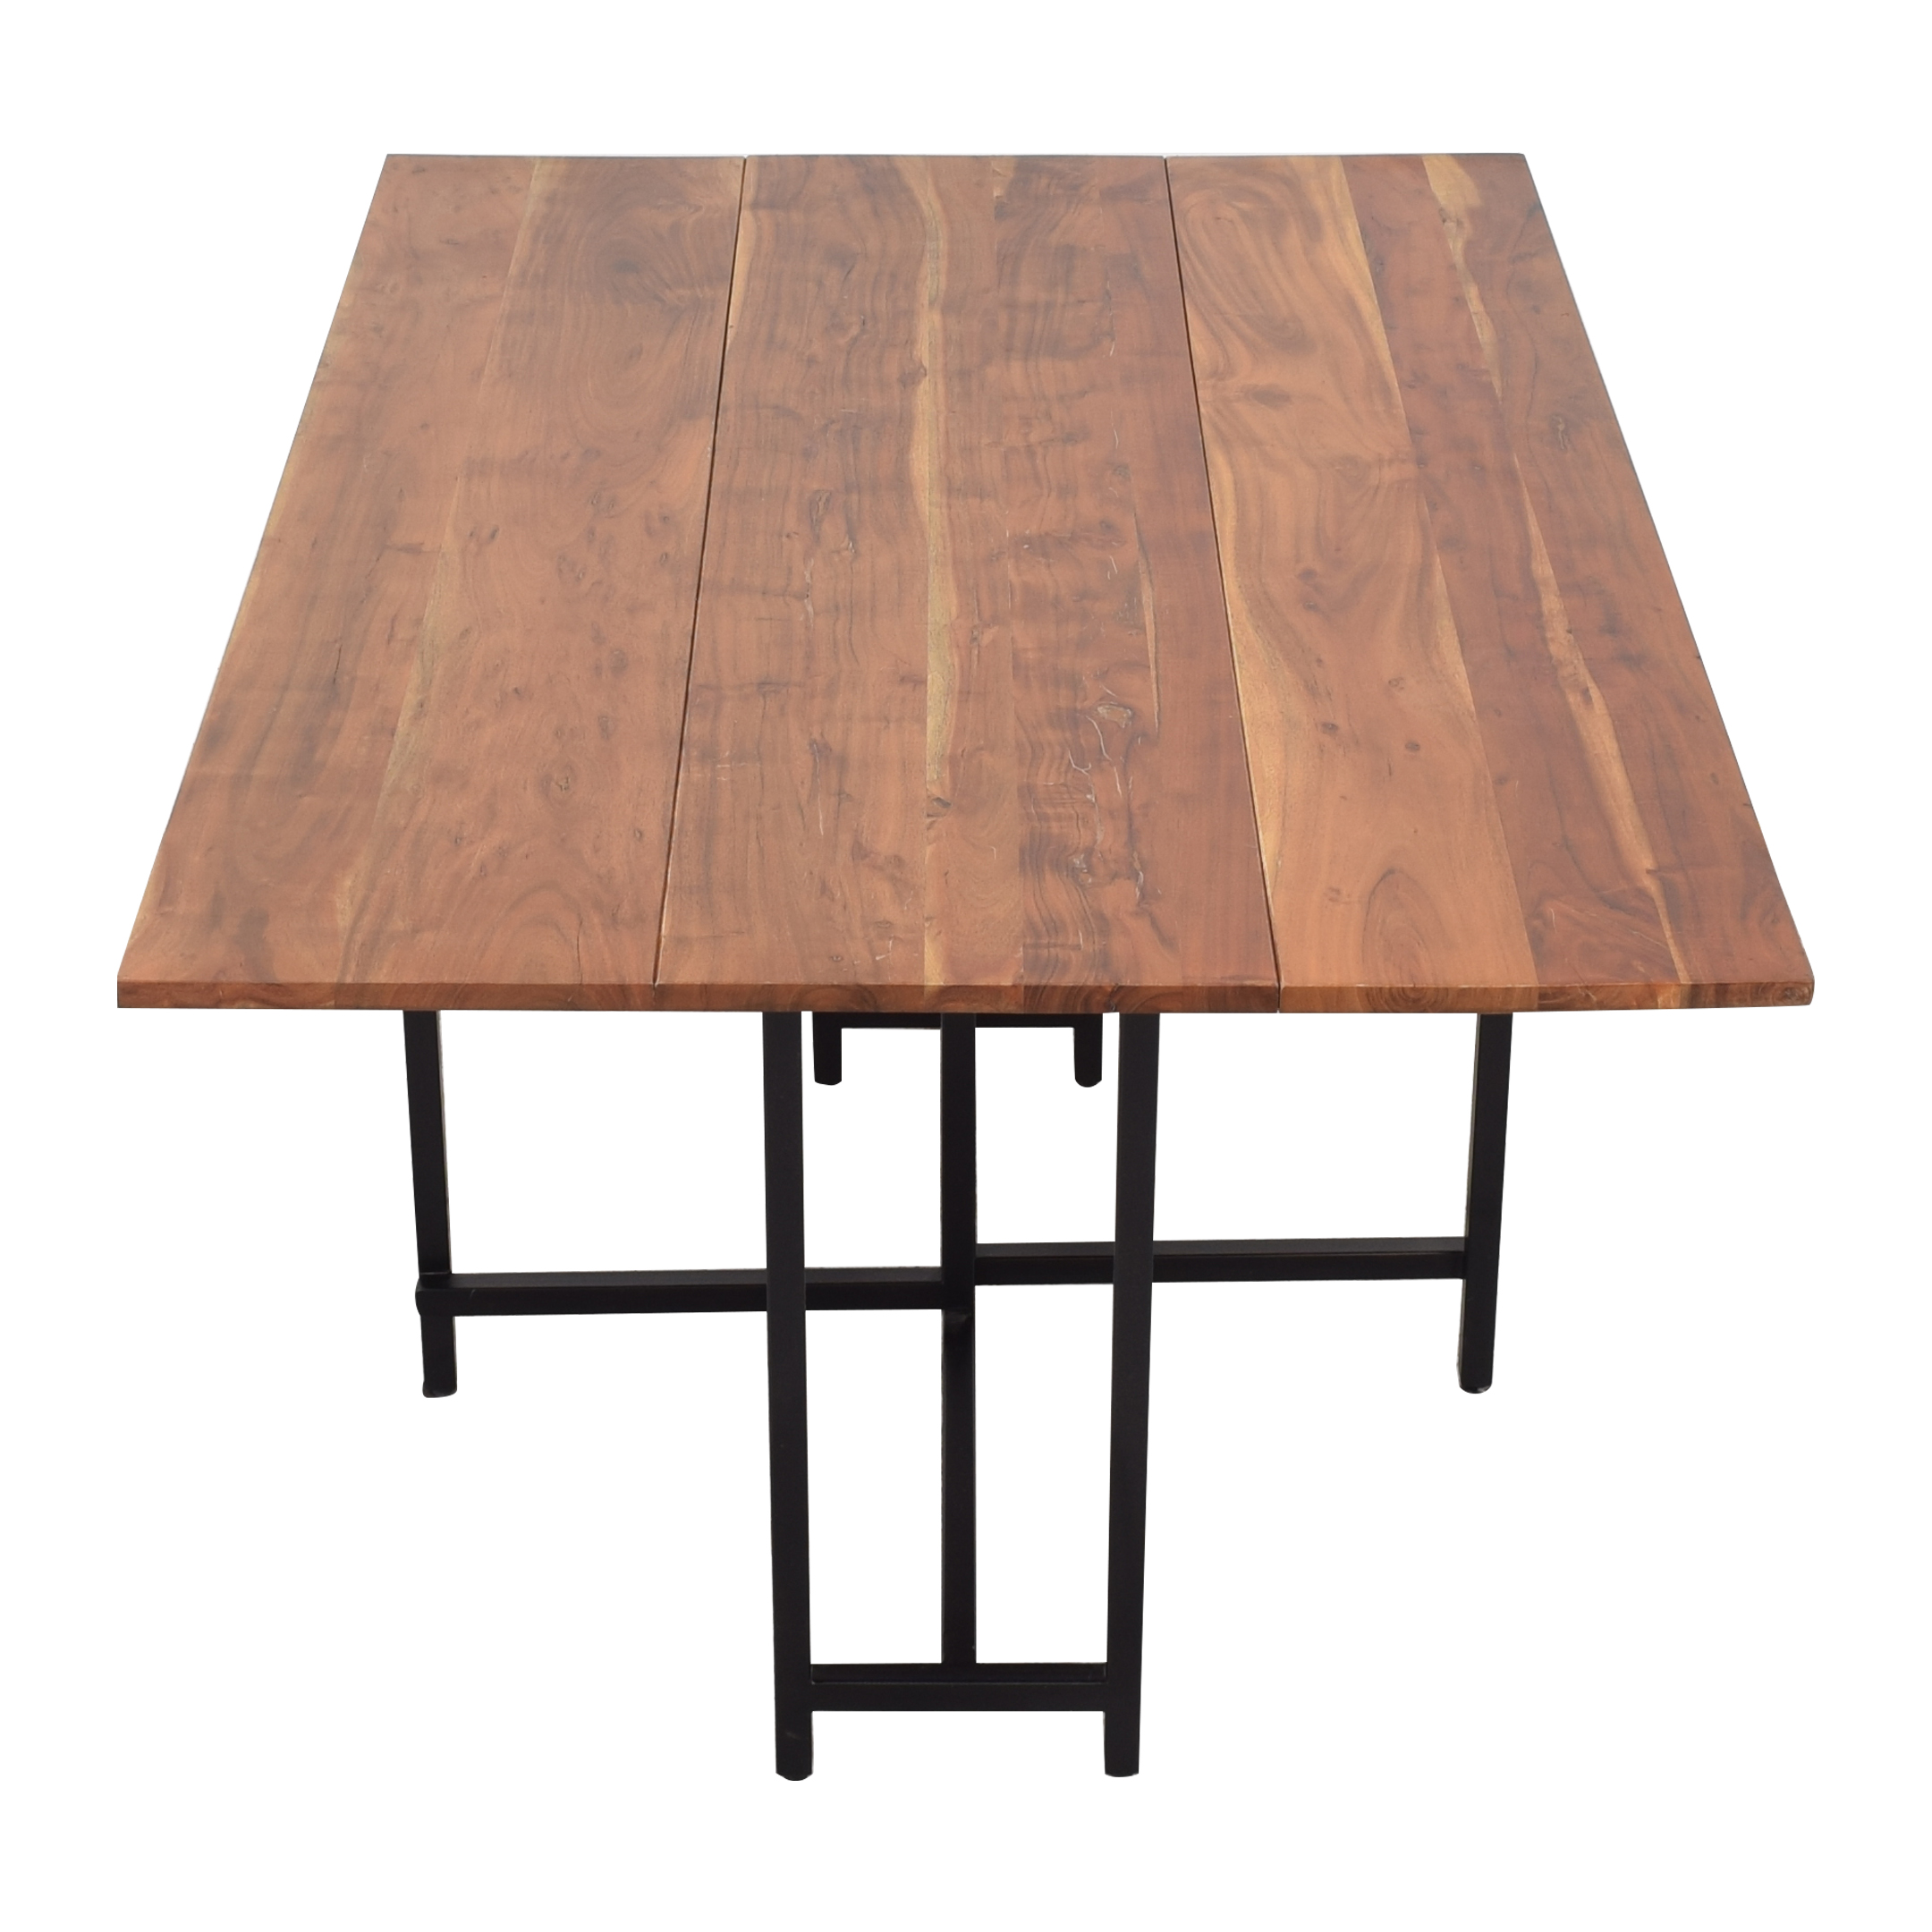 Crate & Barrel Crate & Barrel Origami Drop Leaf Rectangular Dining Table coupon